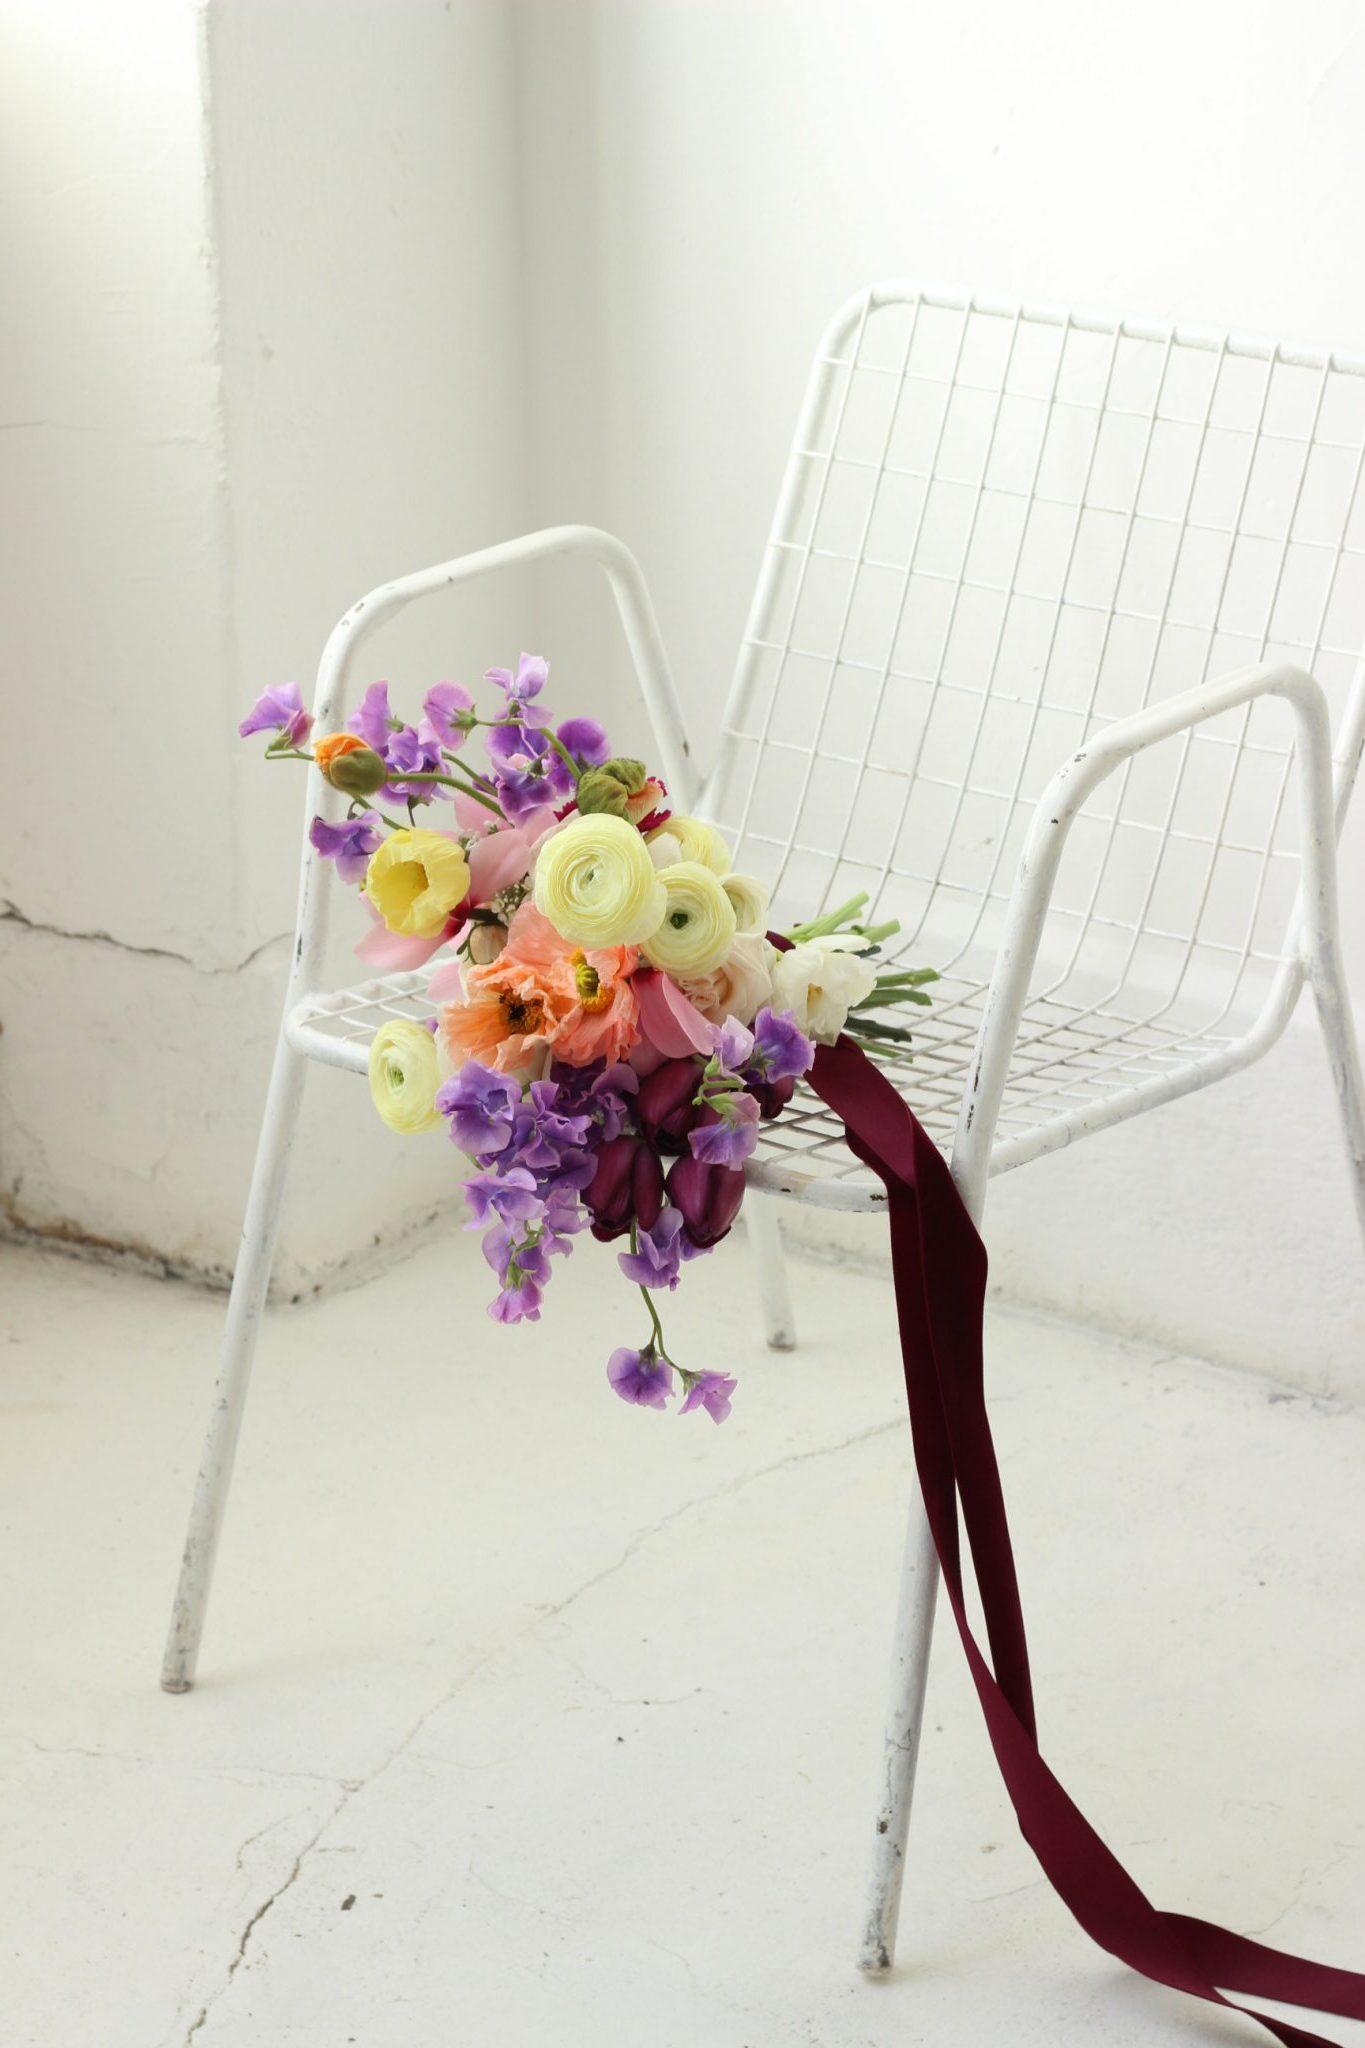 JaunePivoine-fleuristemariage-lyon28